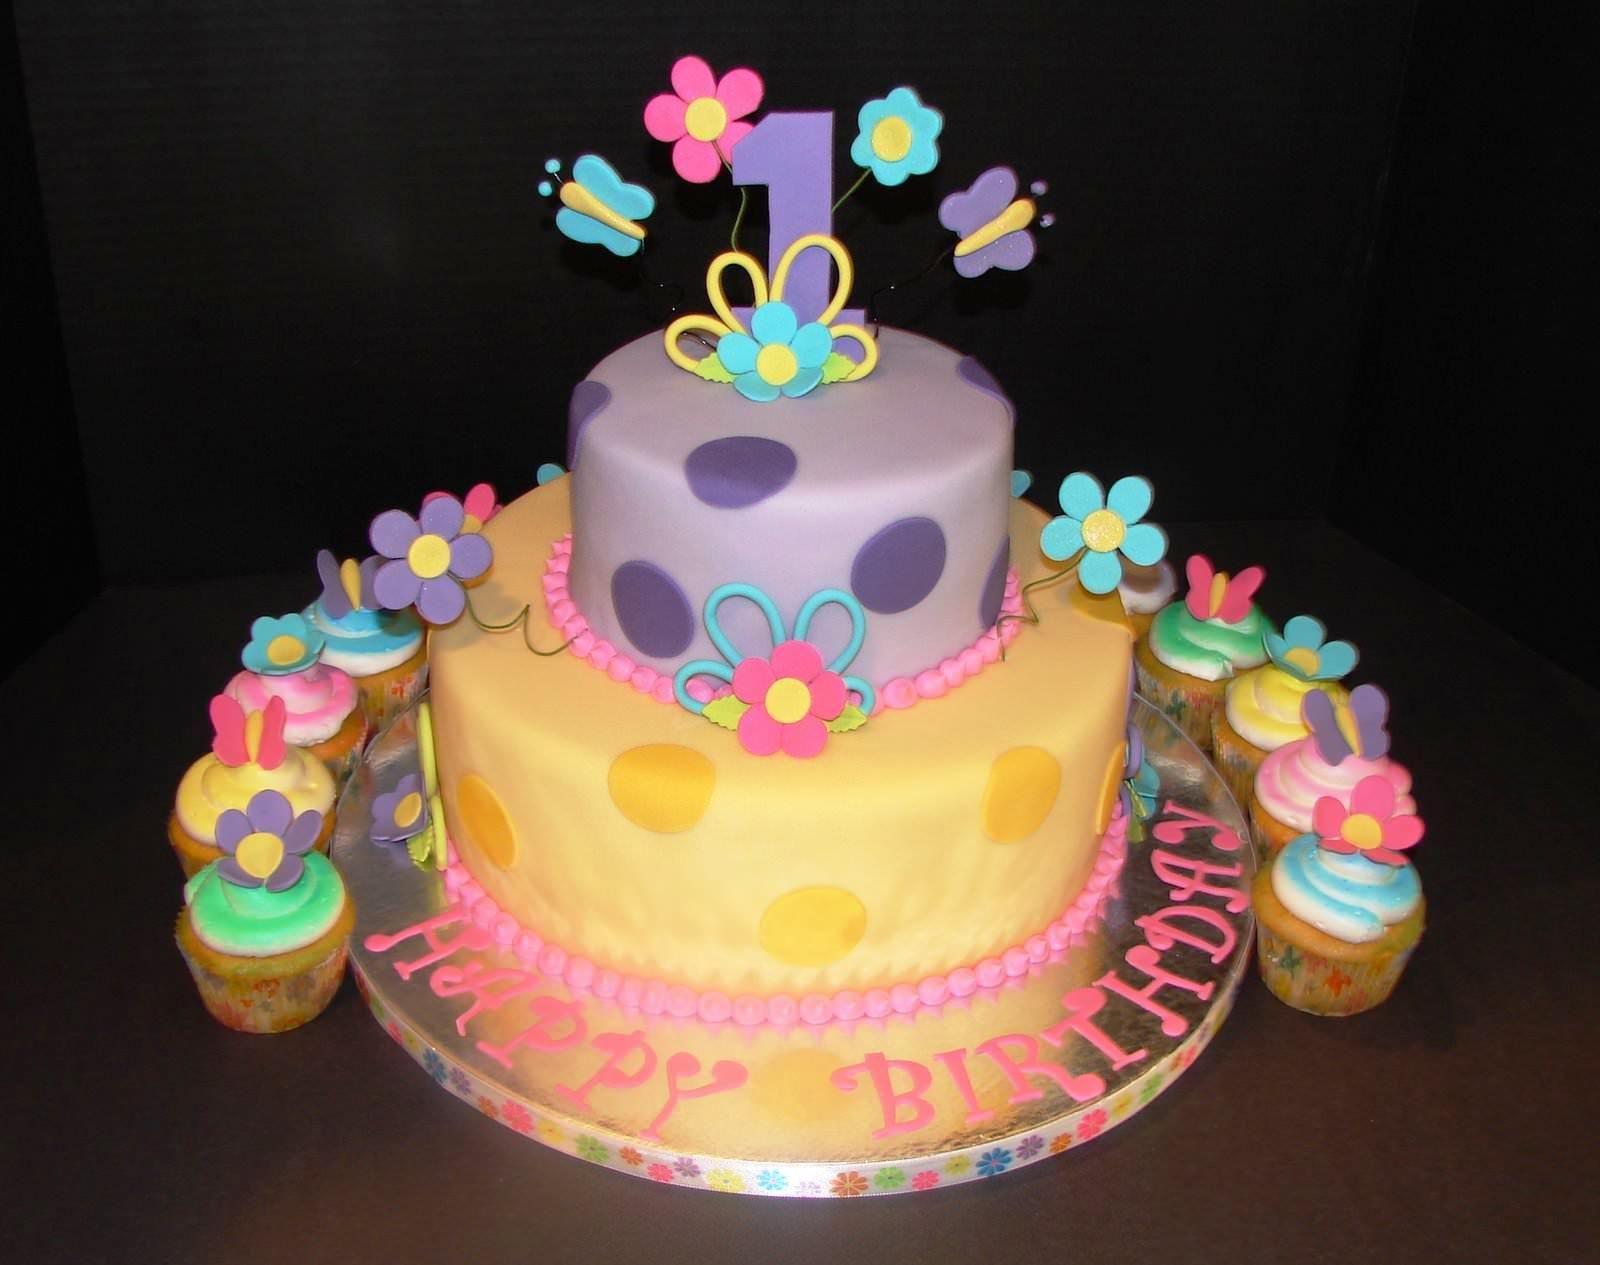 Safeway Cakes Bakery Birthday Cake Designs